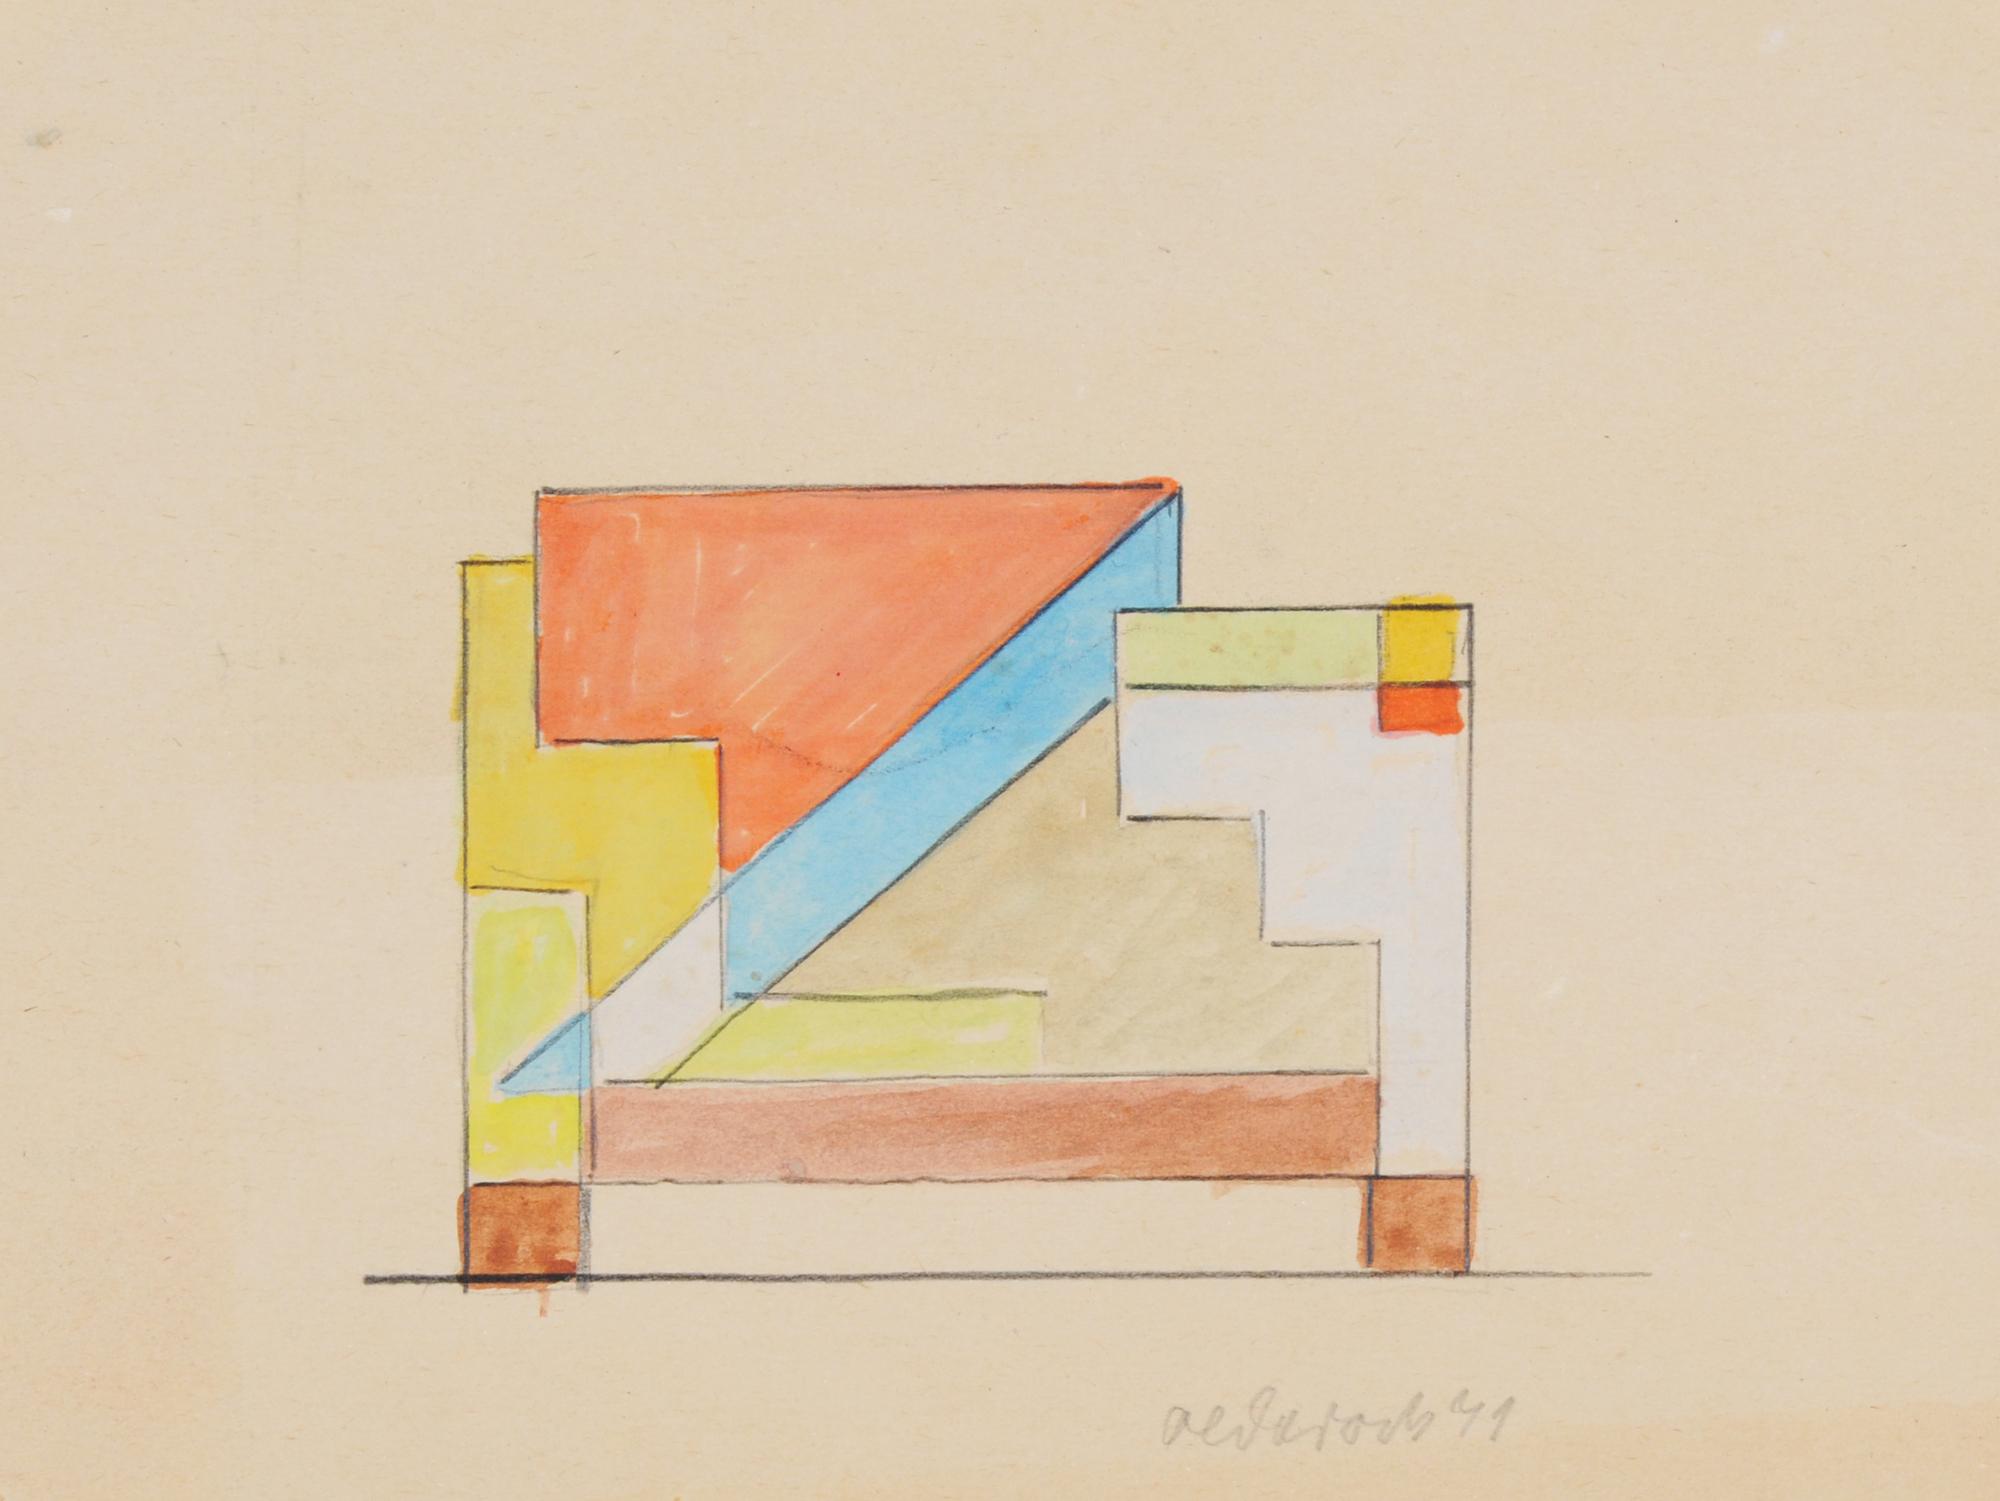 Max Olderock, Composition